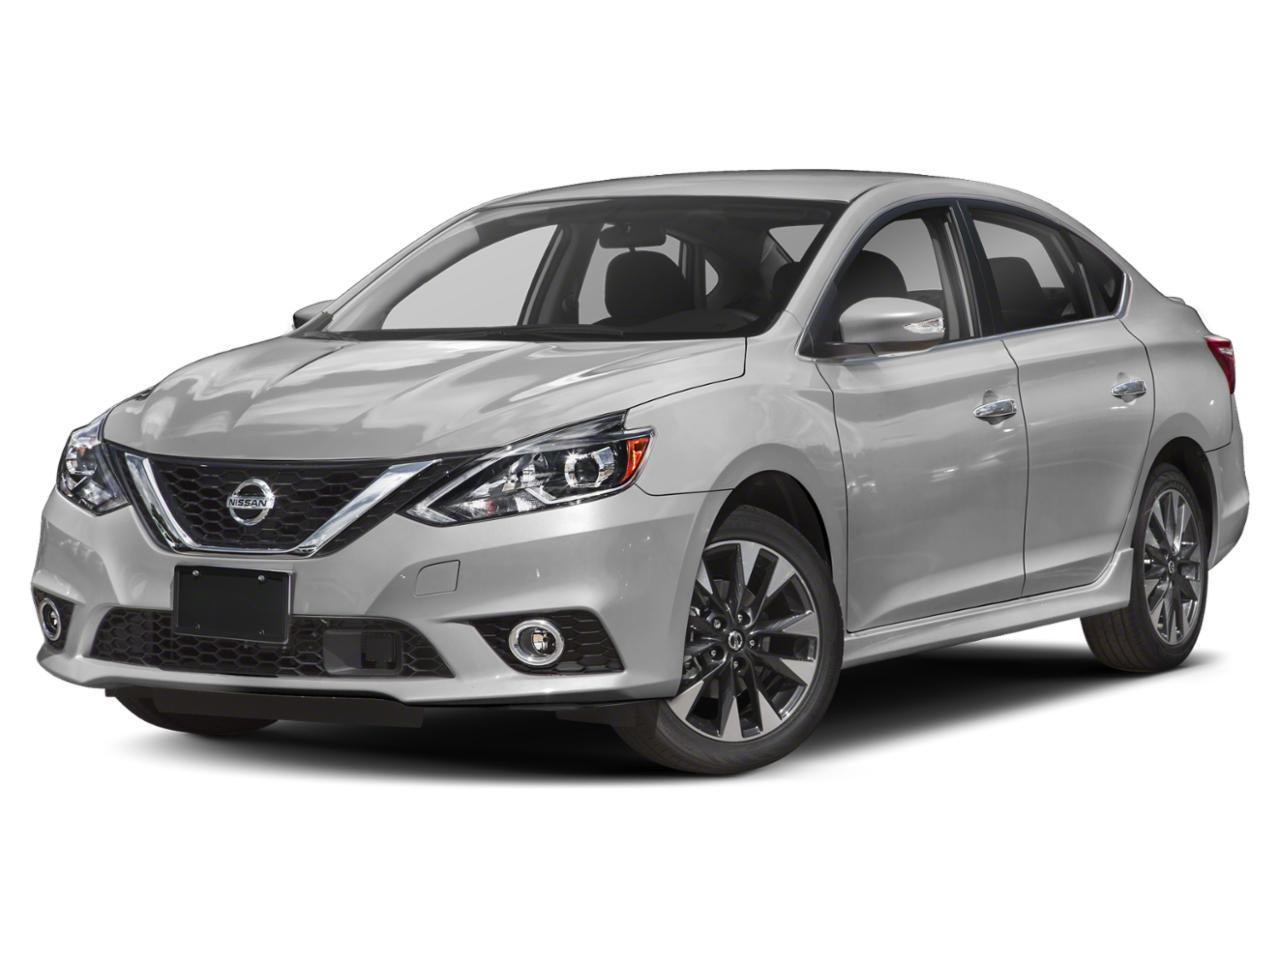 Used 2019 Nissan Sentra Sr In Brilliant Silver Metallic For Sale In Huntsville Alabama P221005